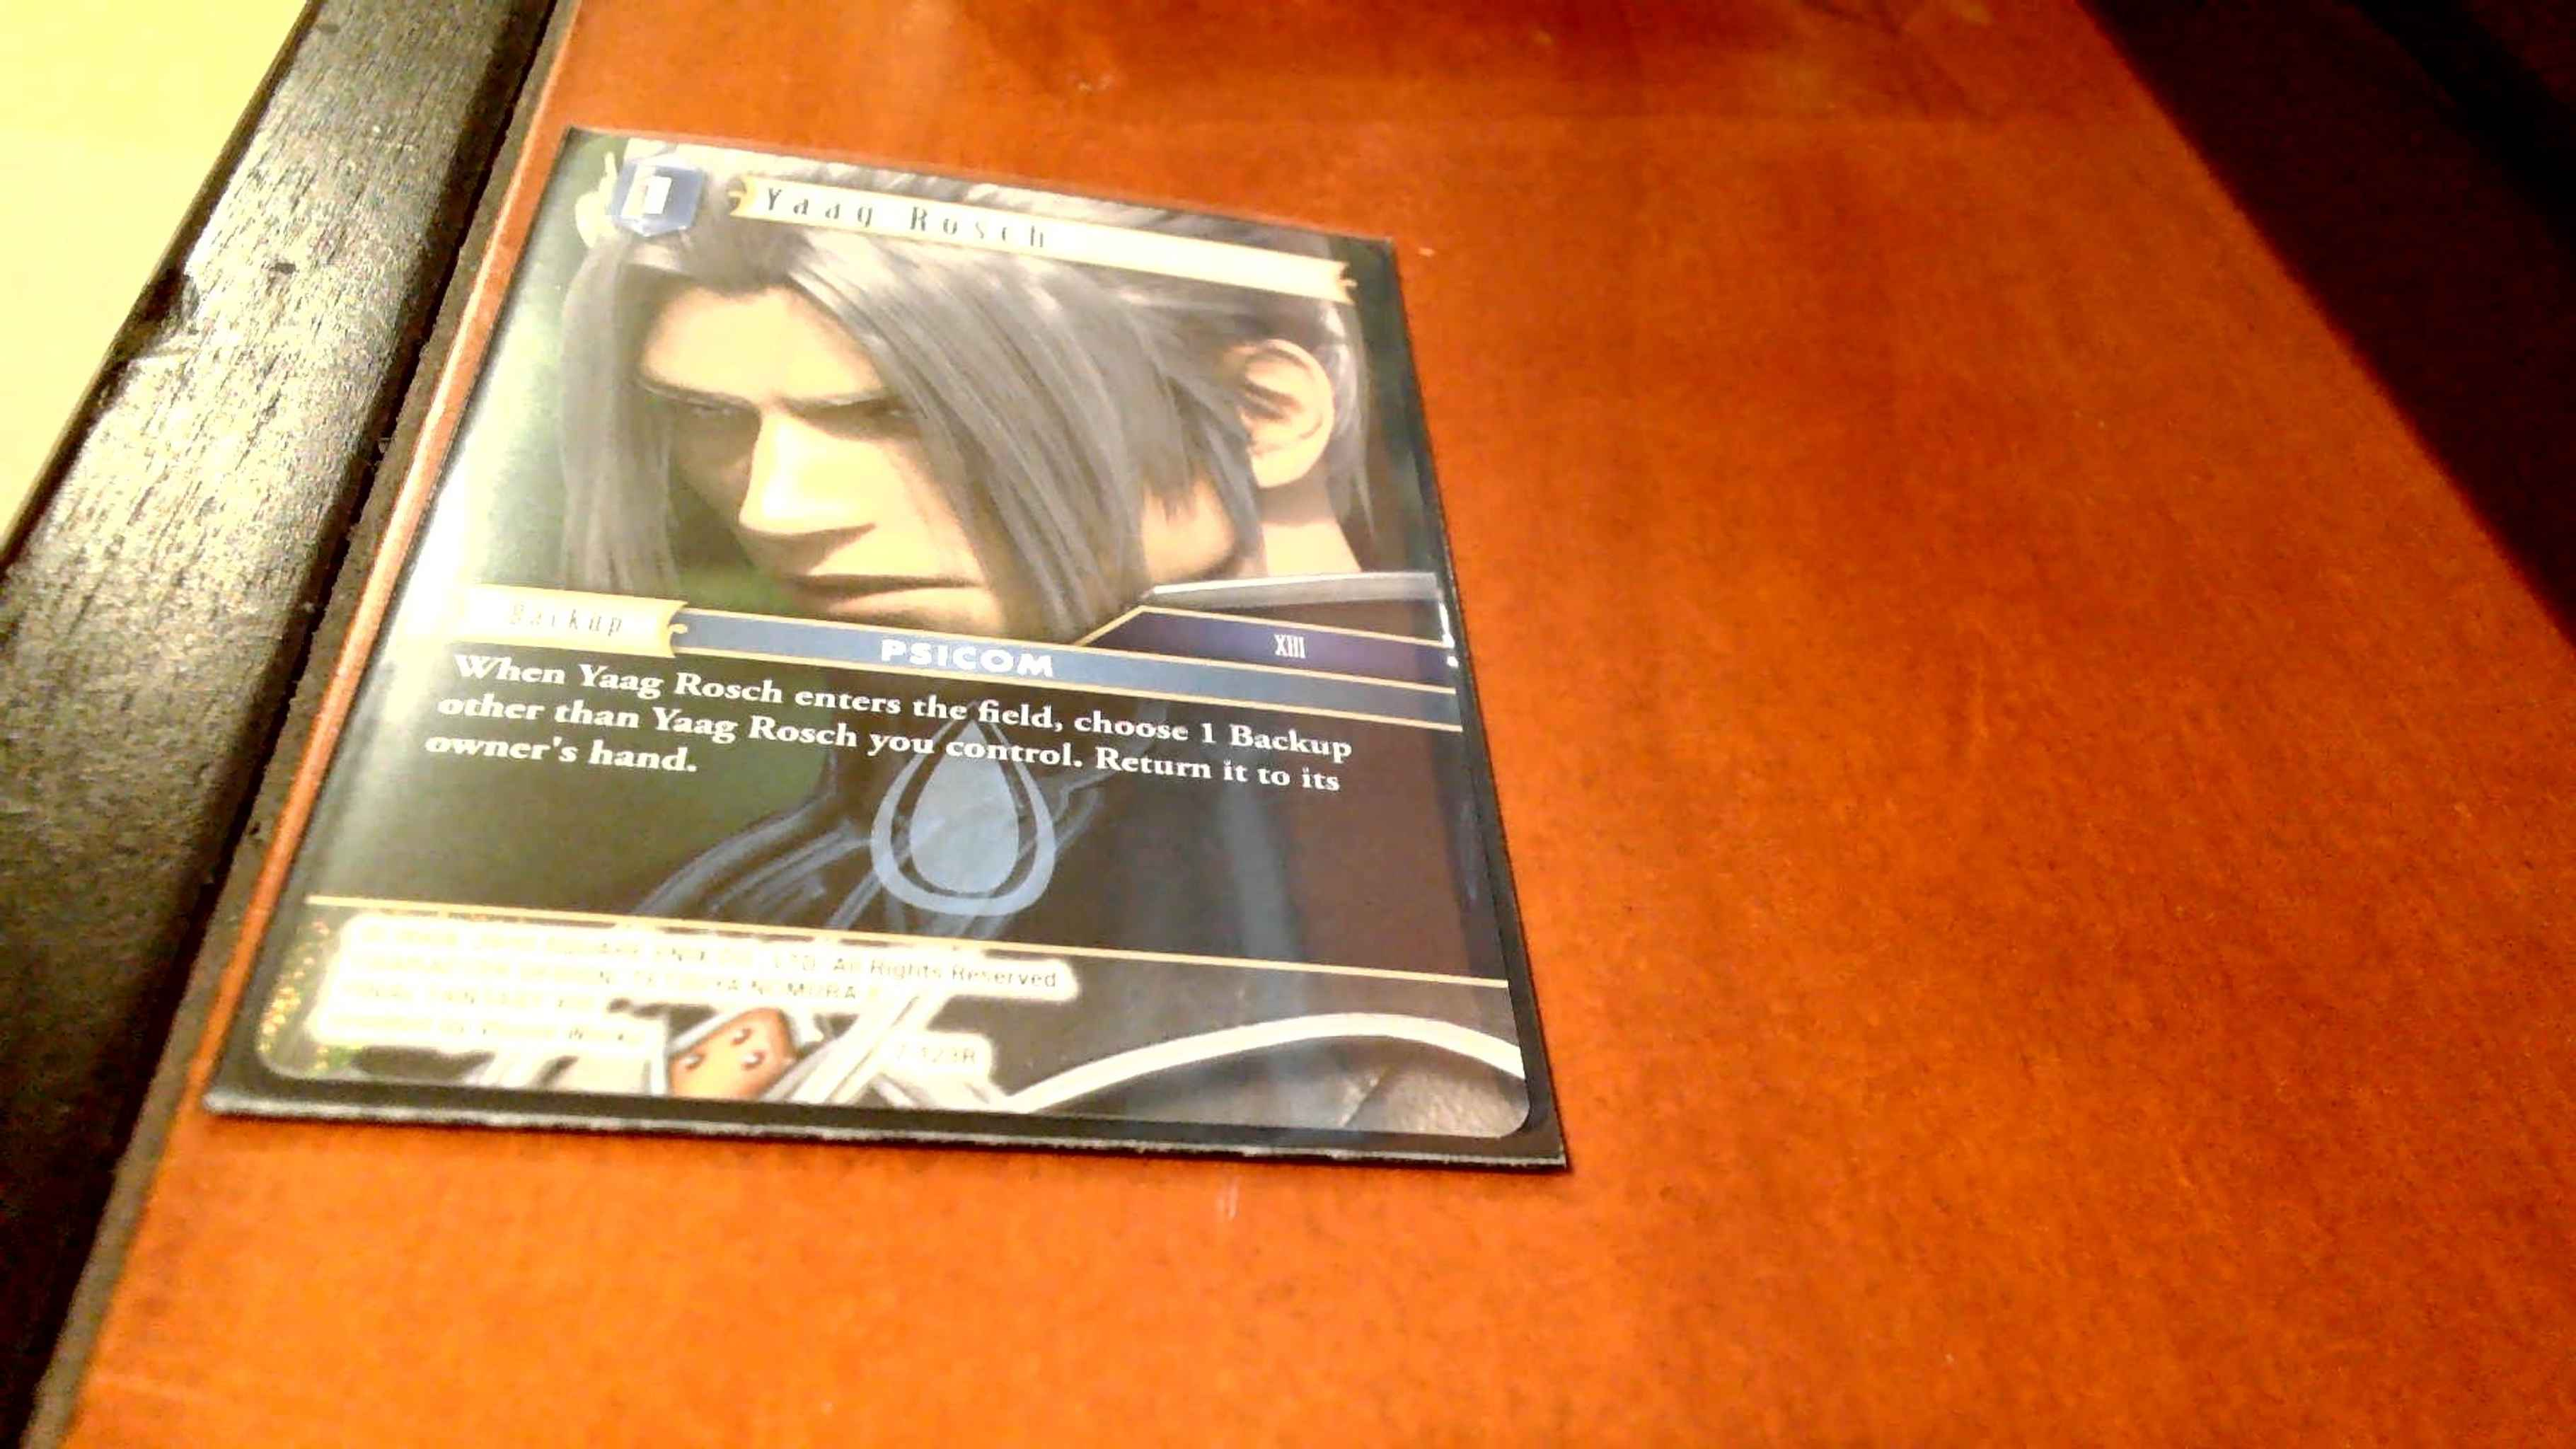 Yaag Rosch 7-123R Rare Water Final Fantasy TCG: Opus 7